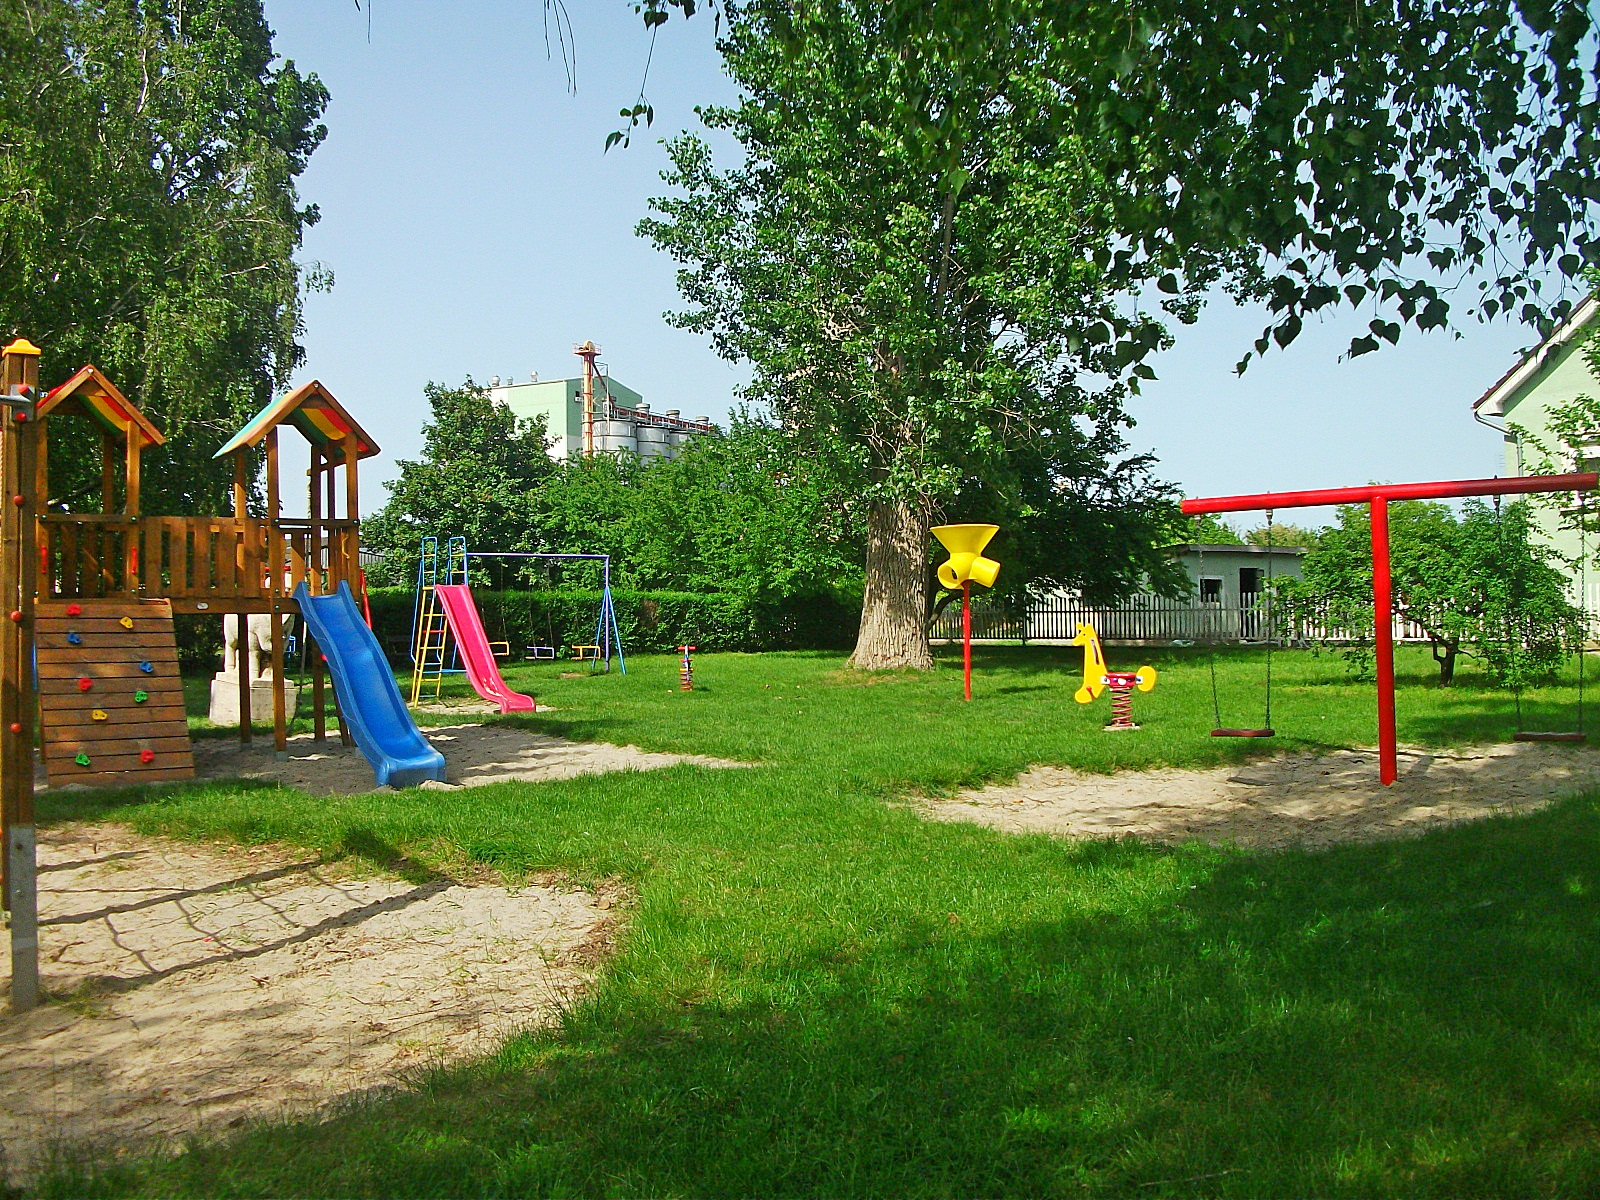 File Playground Zichy 250 Jfalu 02 Jpg Wikimedia Commons